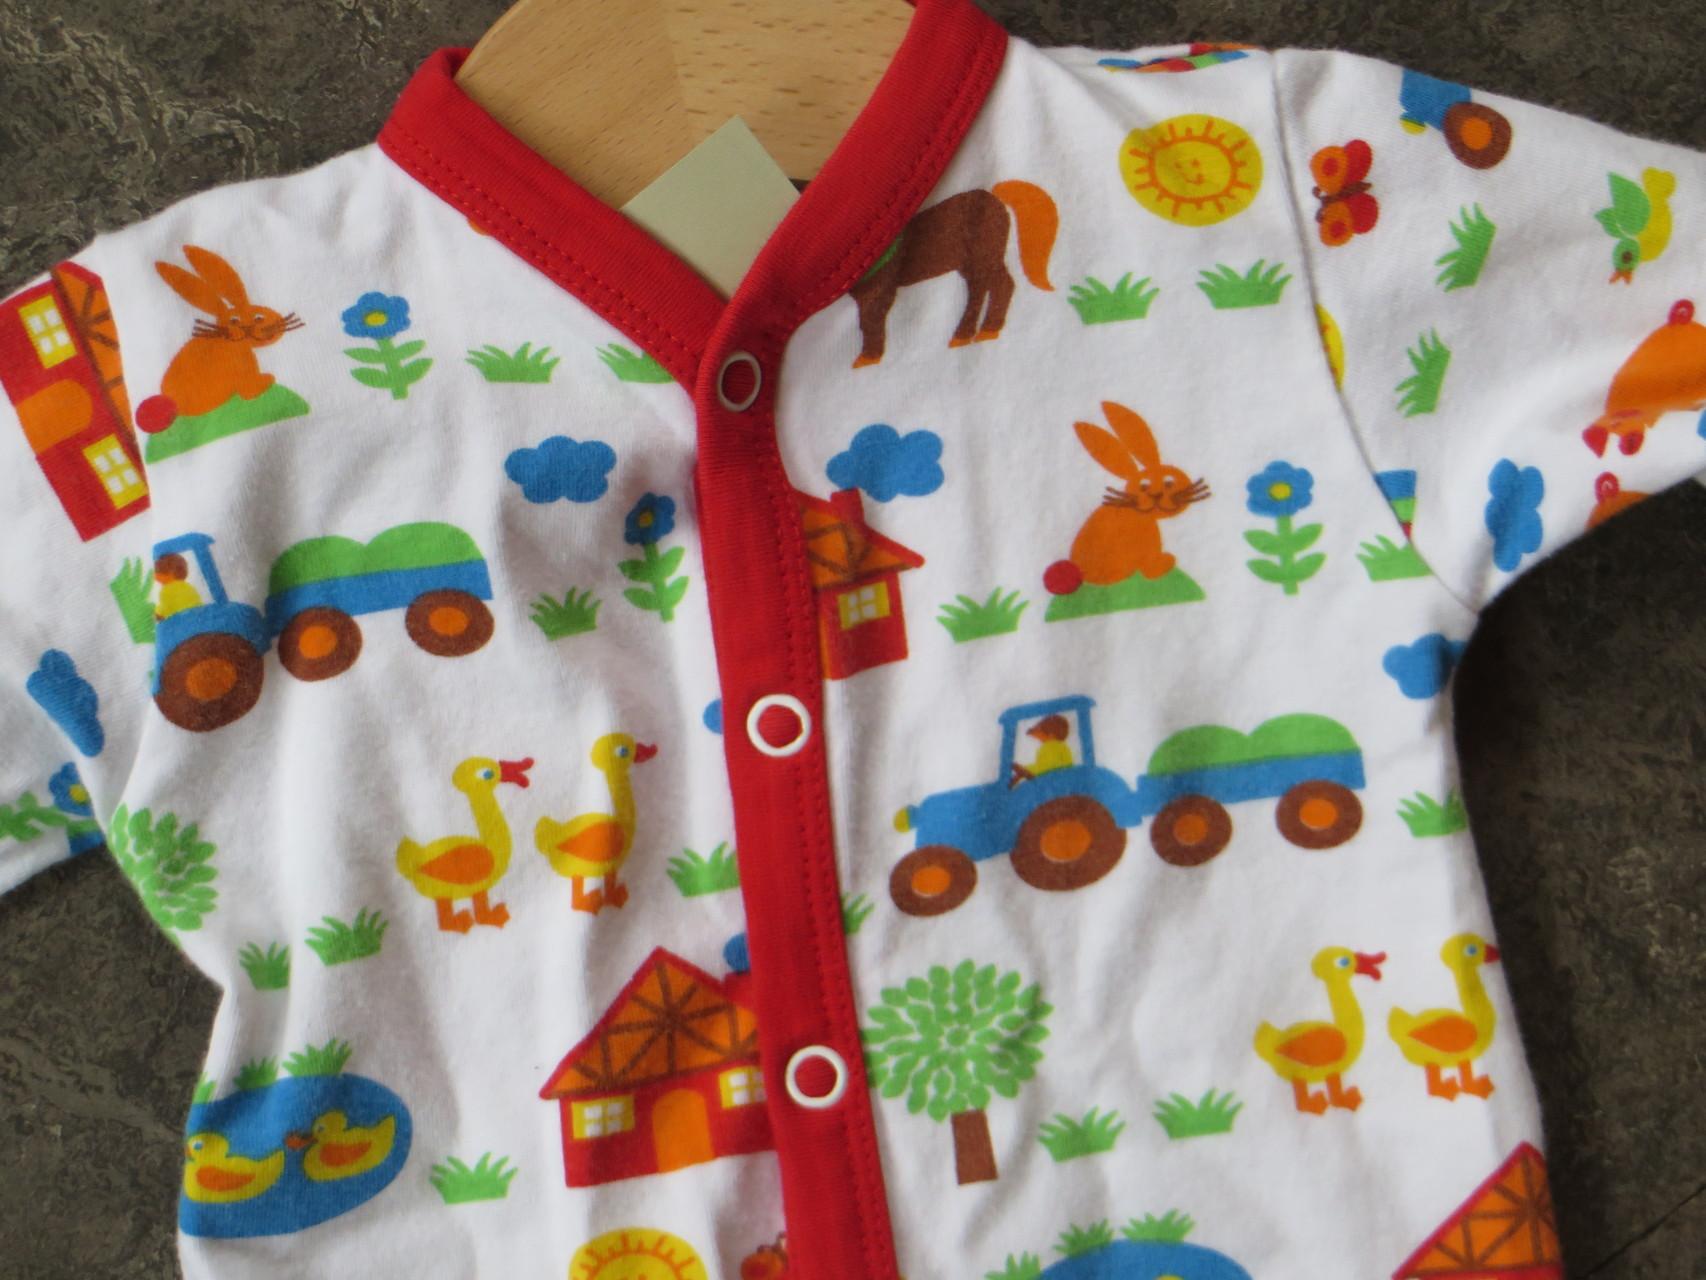 Pyjama - Baby Graziella - 3-6 Mo - 19.50 chf - Second Hand